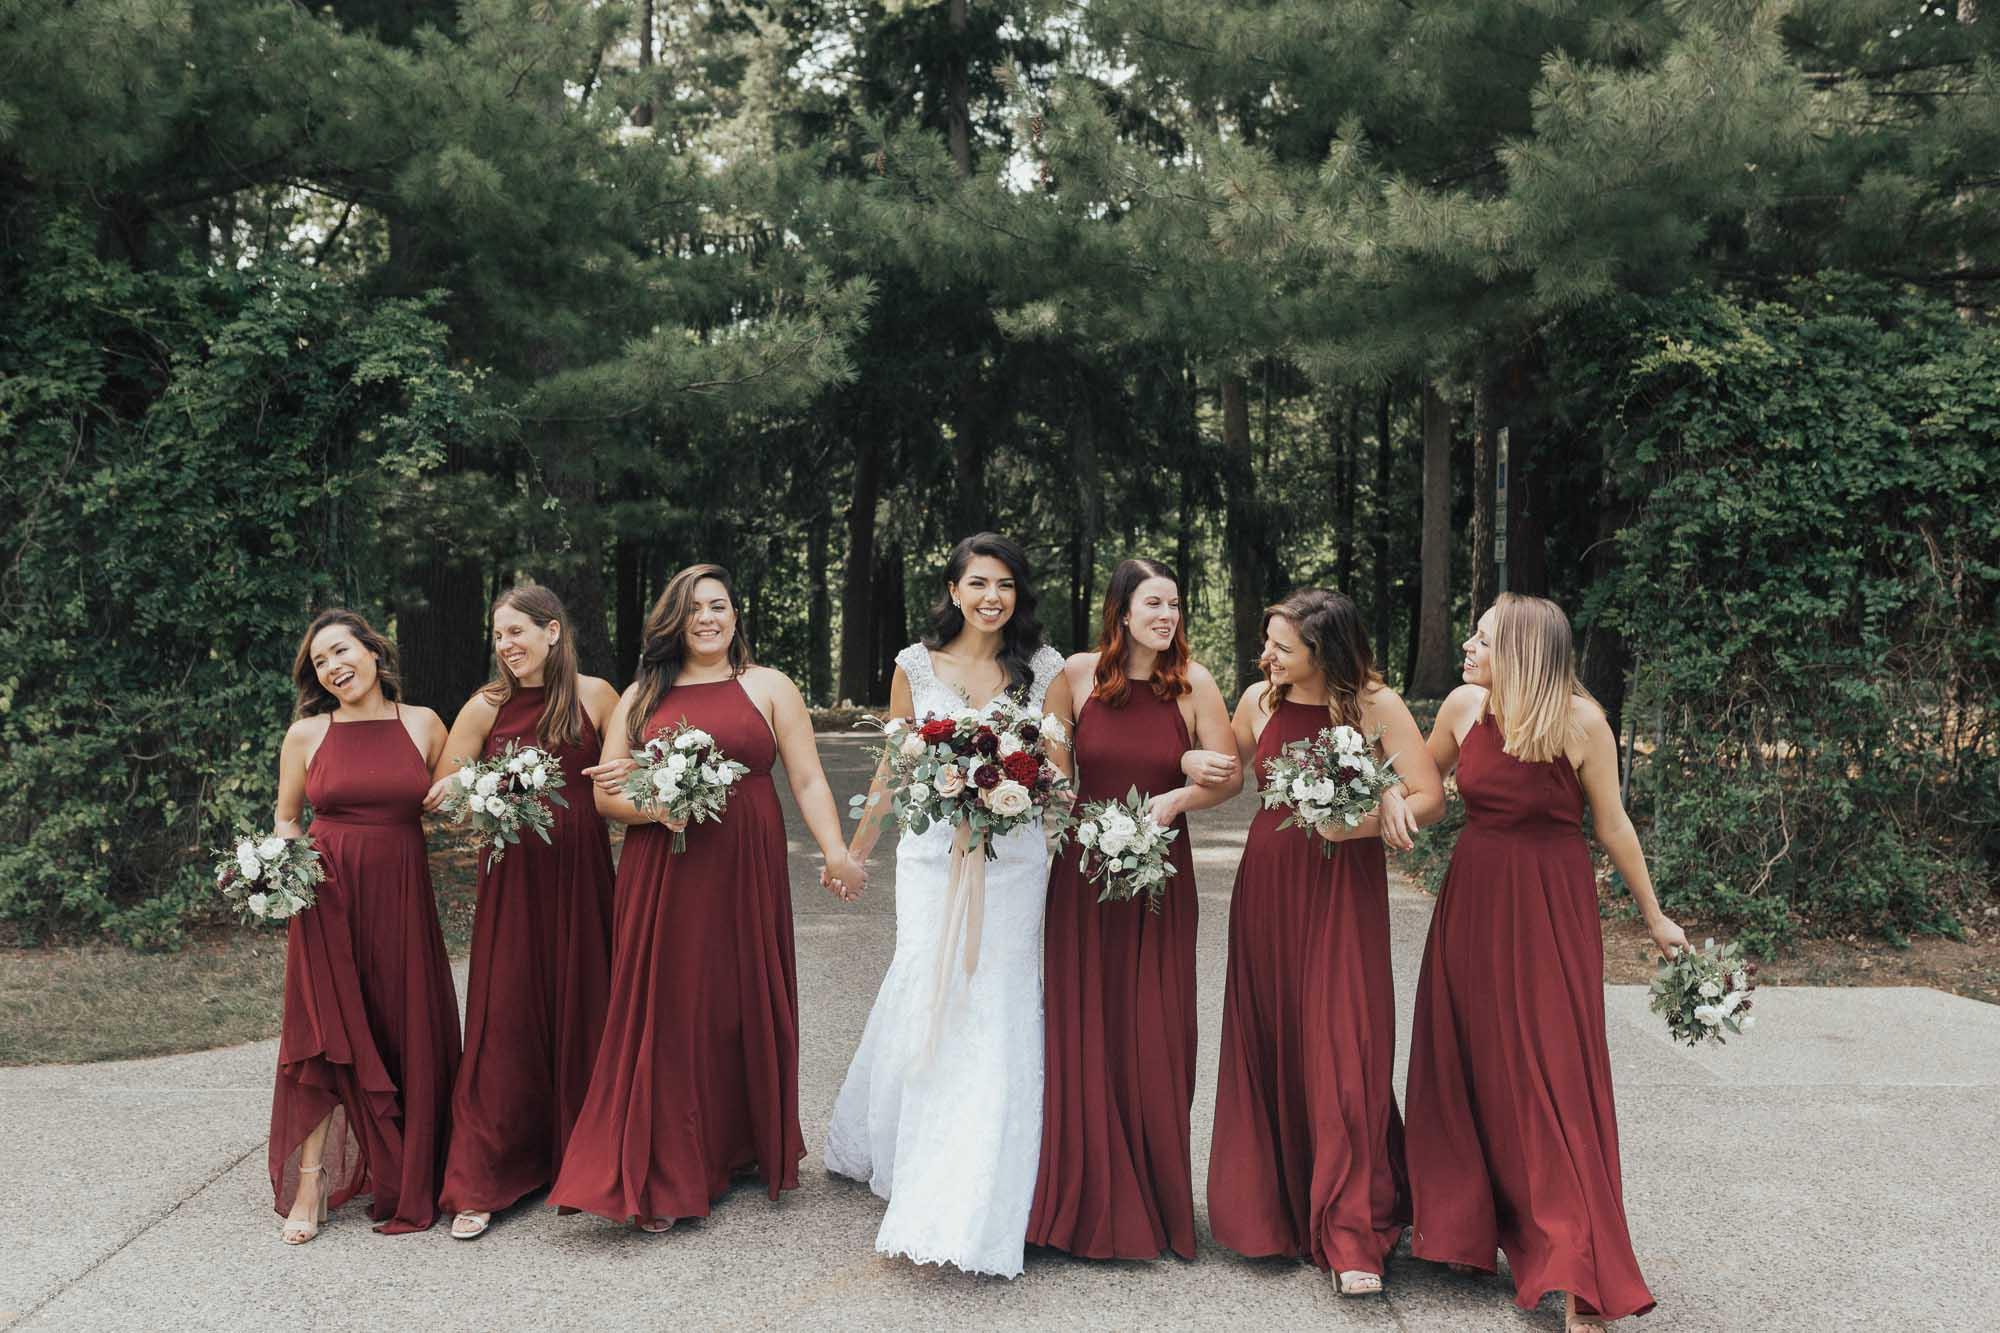 champaign_il_wedding_photography-0231.jpg